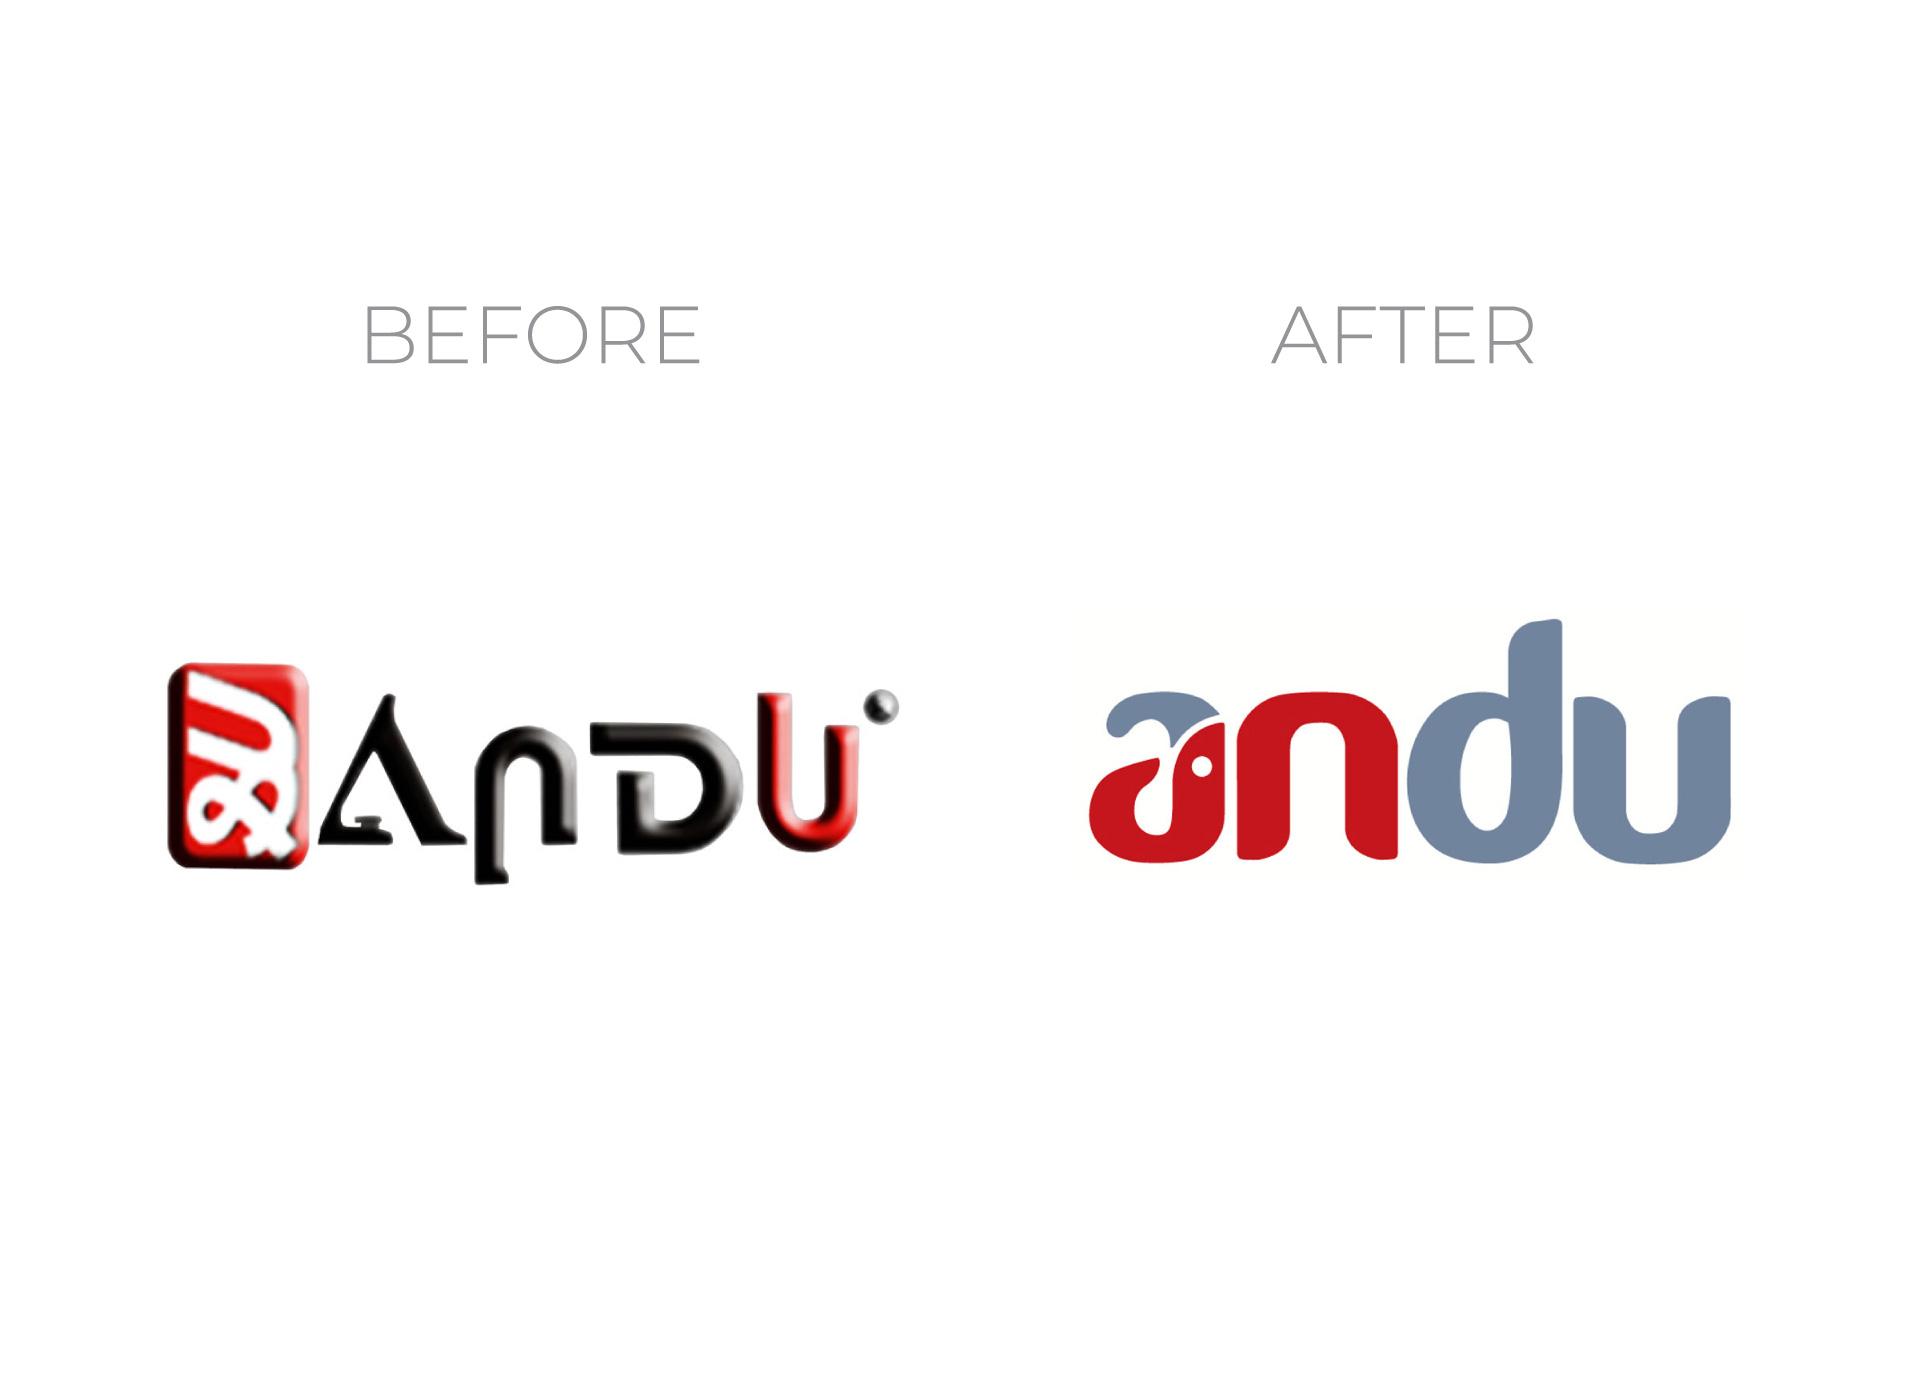 andu portfolio inoveo before and after rebranding